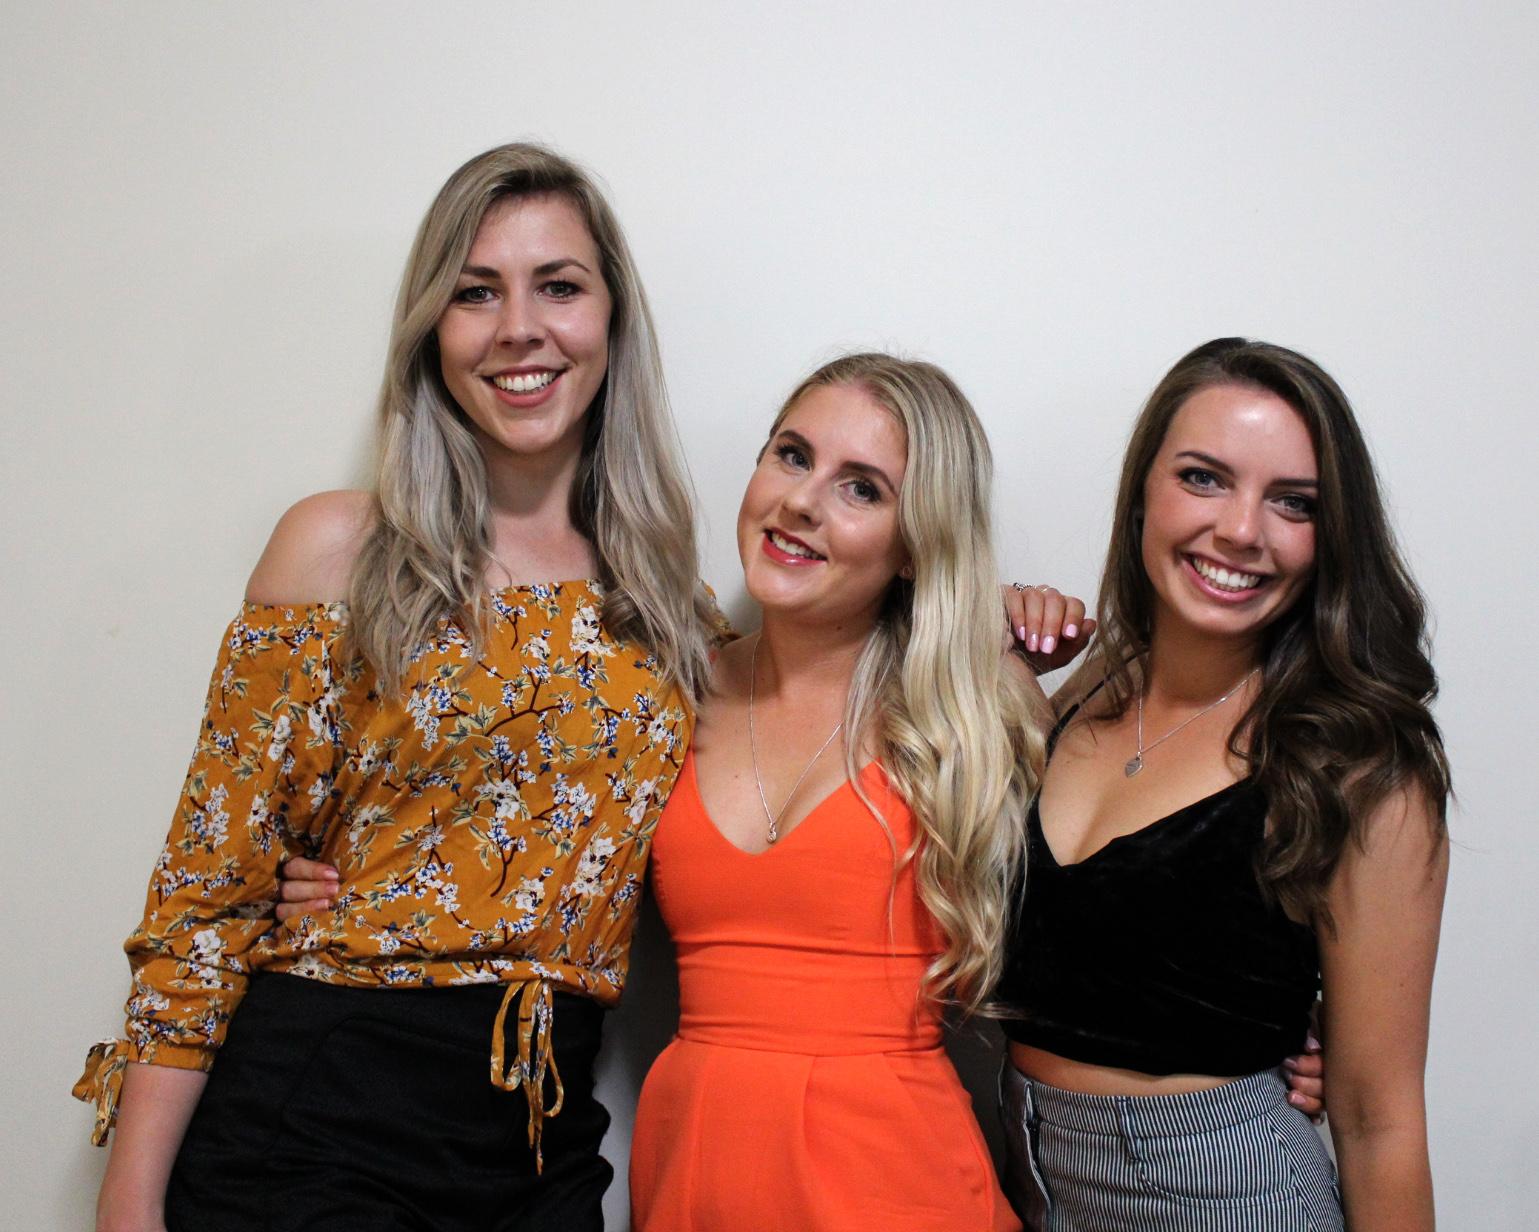 The 2017 ruond-up Gold Coast